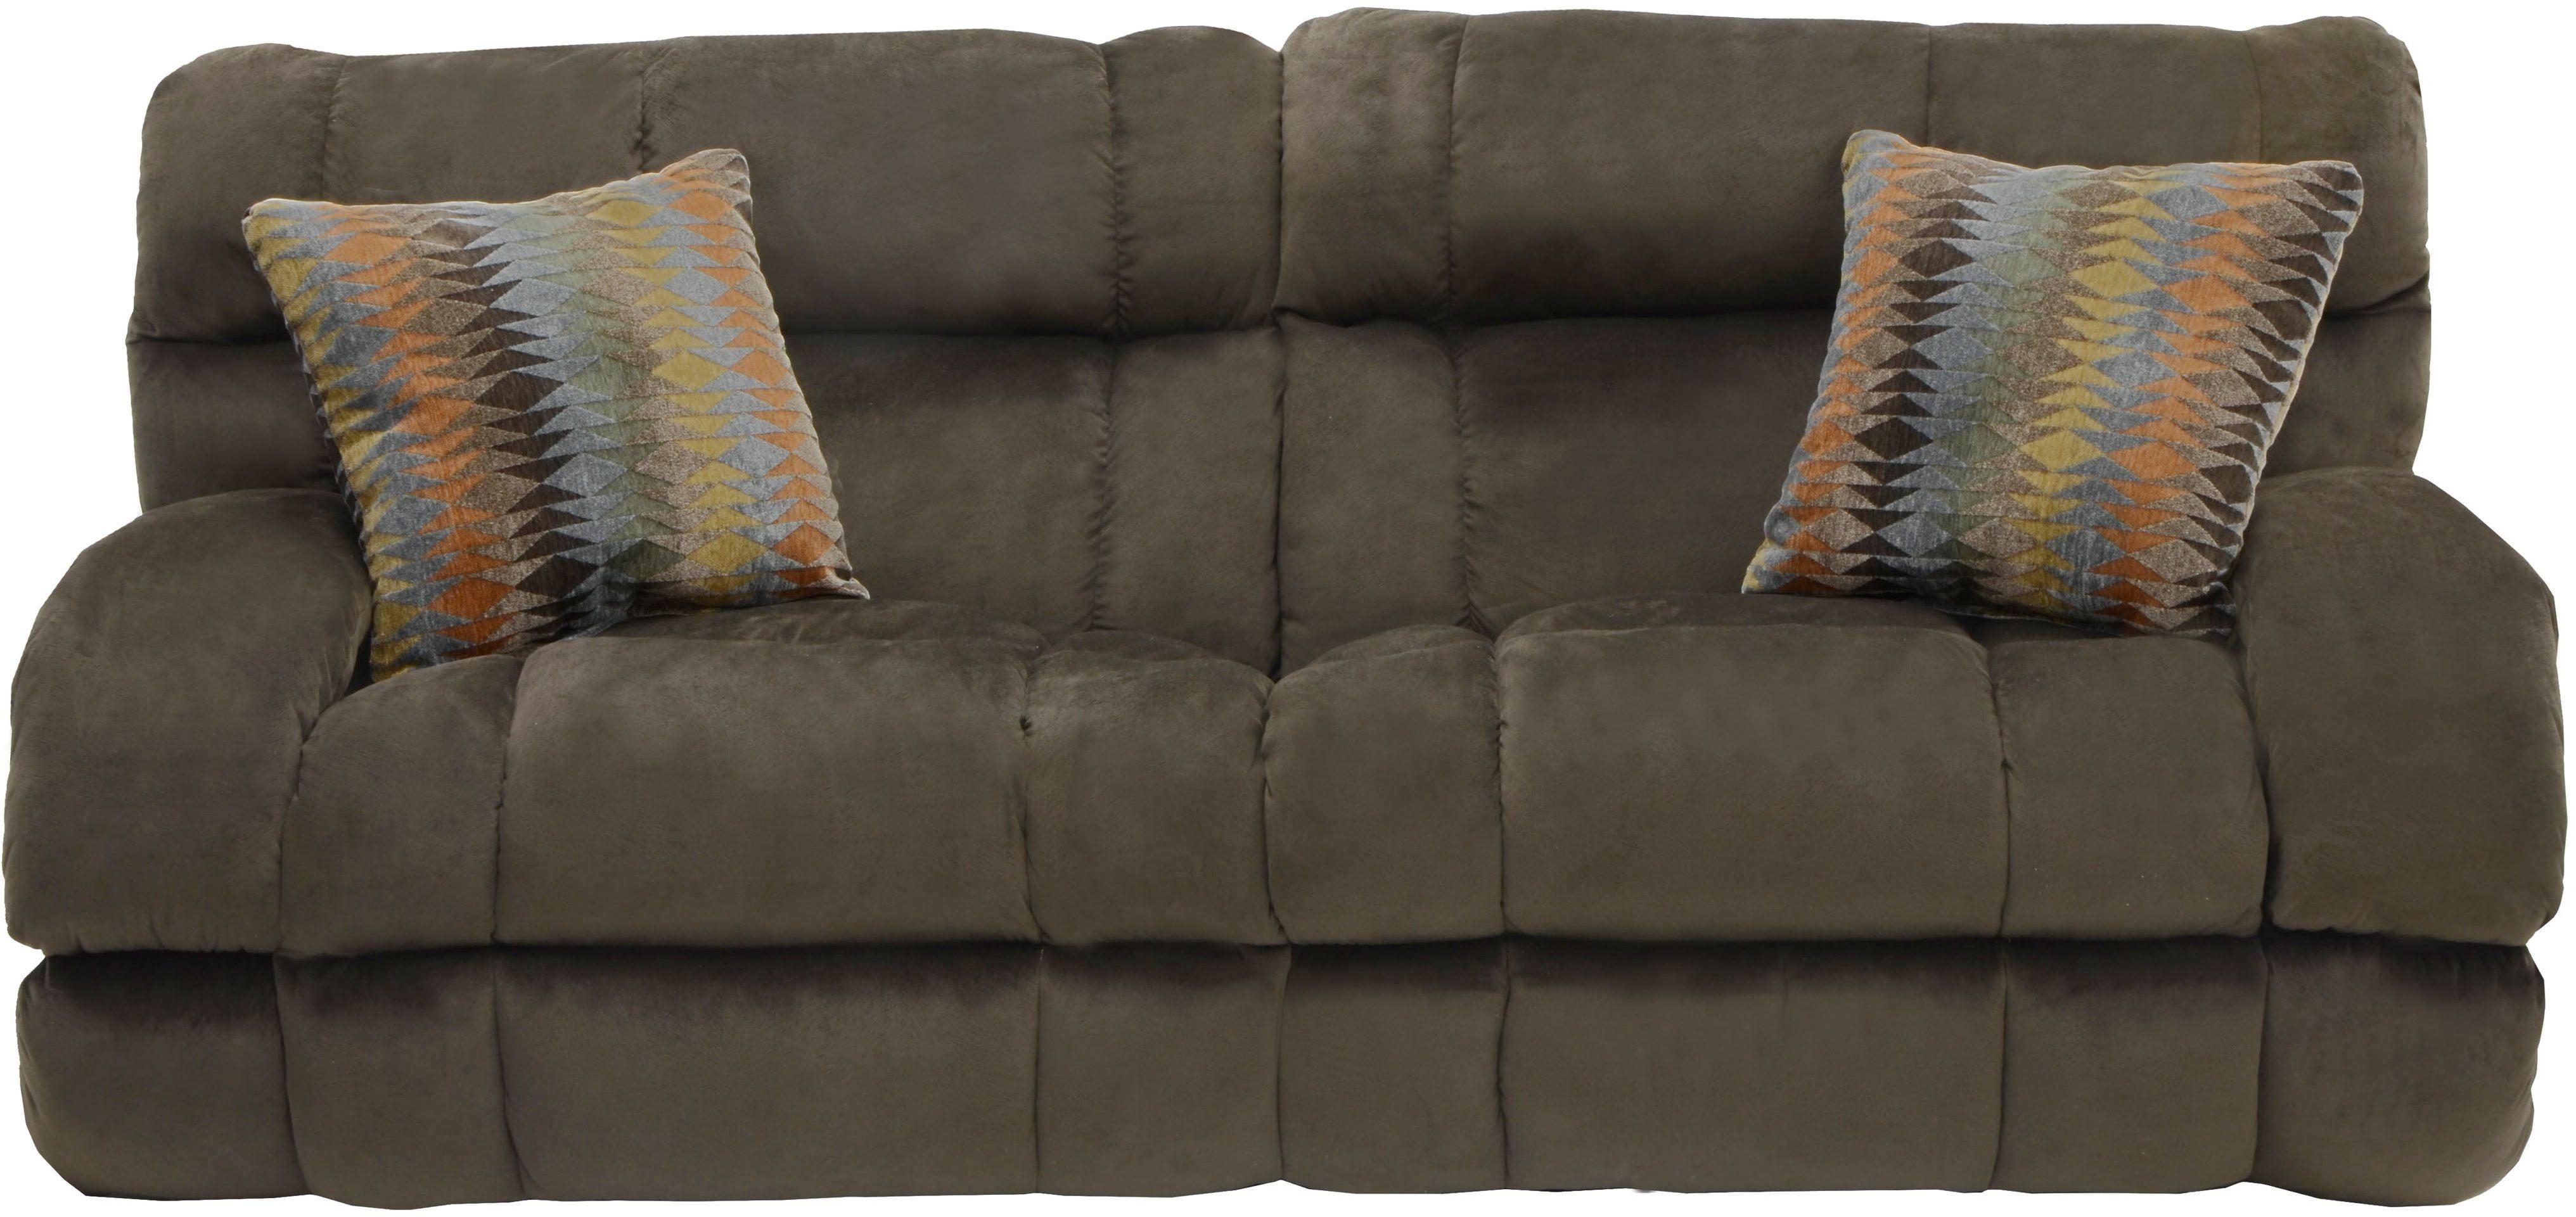 power reclining sofa made in usa eq3 review siesta chocolate 61761268109275143